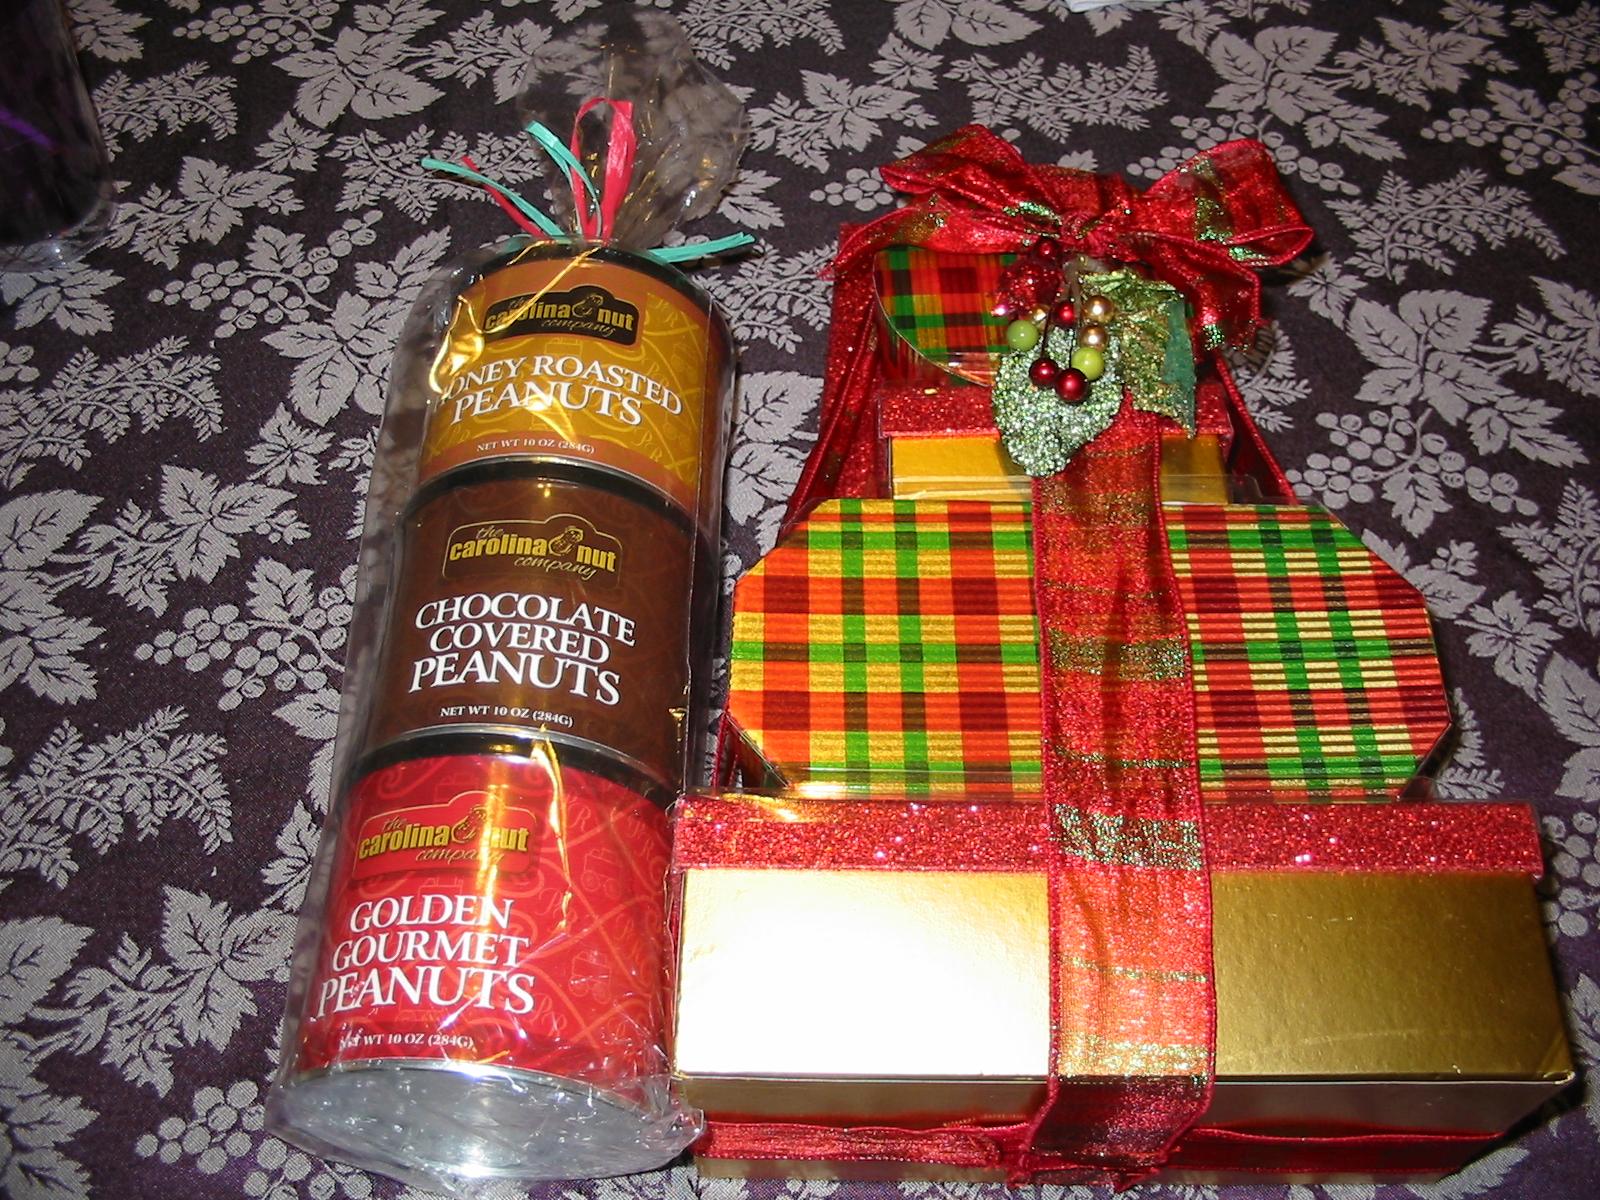 Sam S Club Chocolate Covered Peanuts